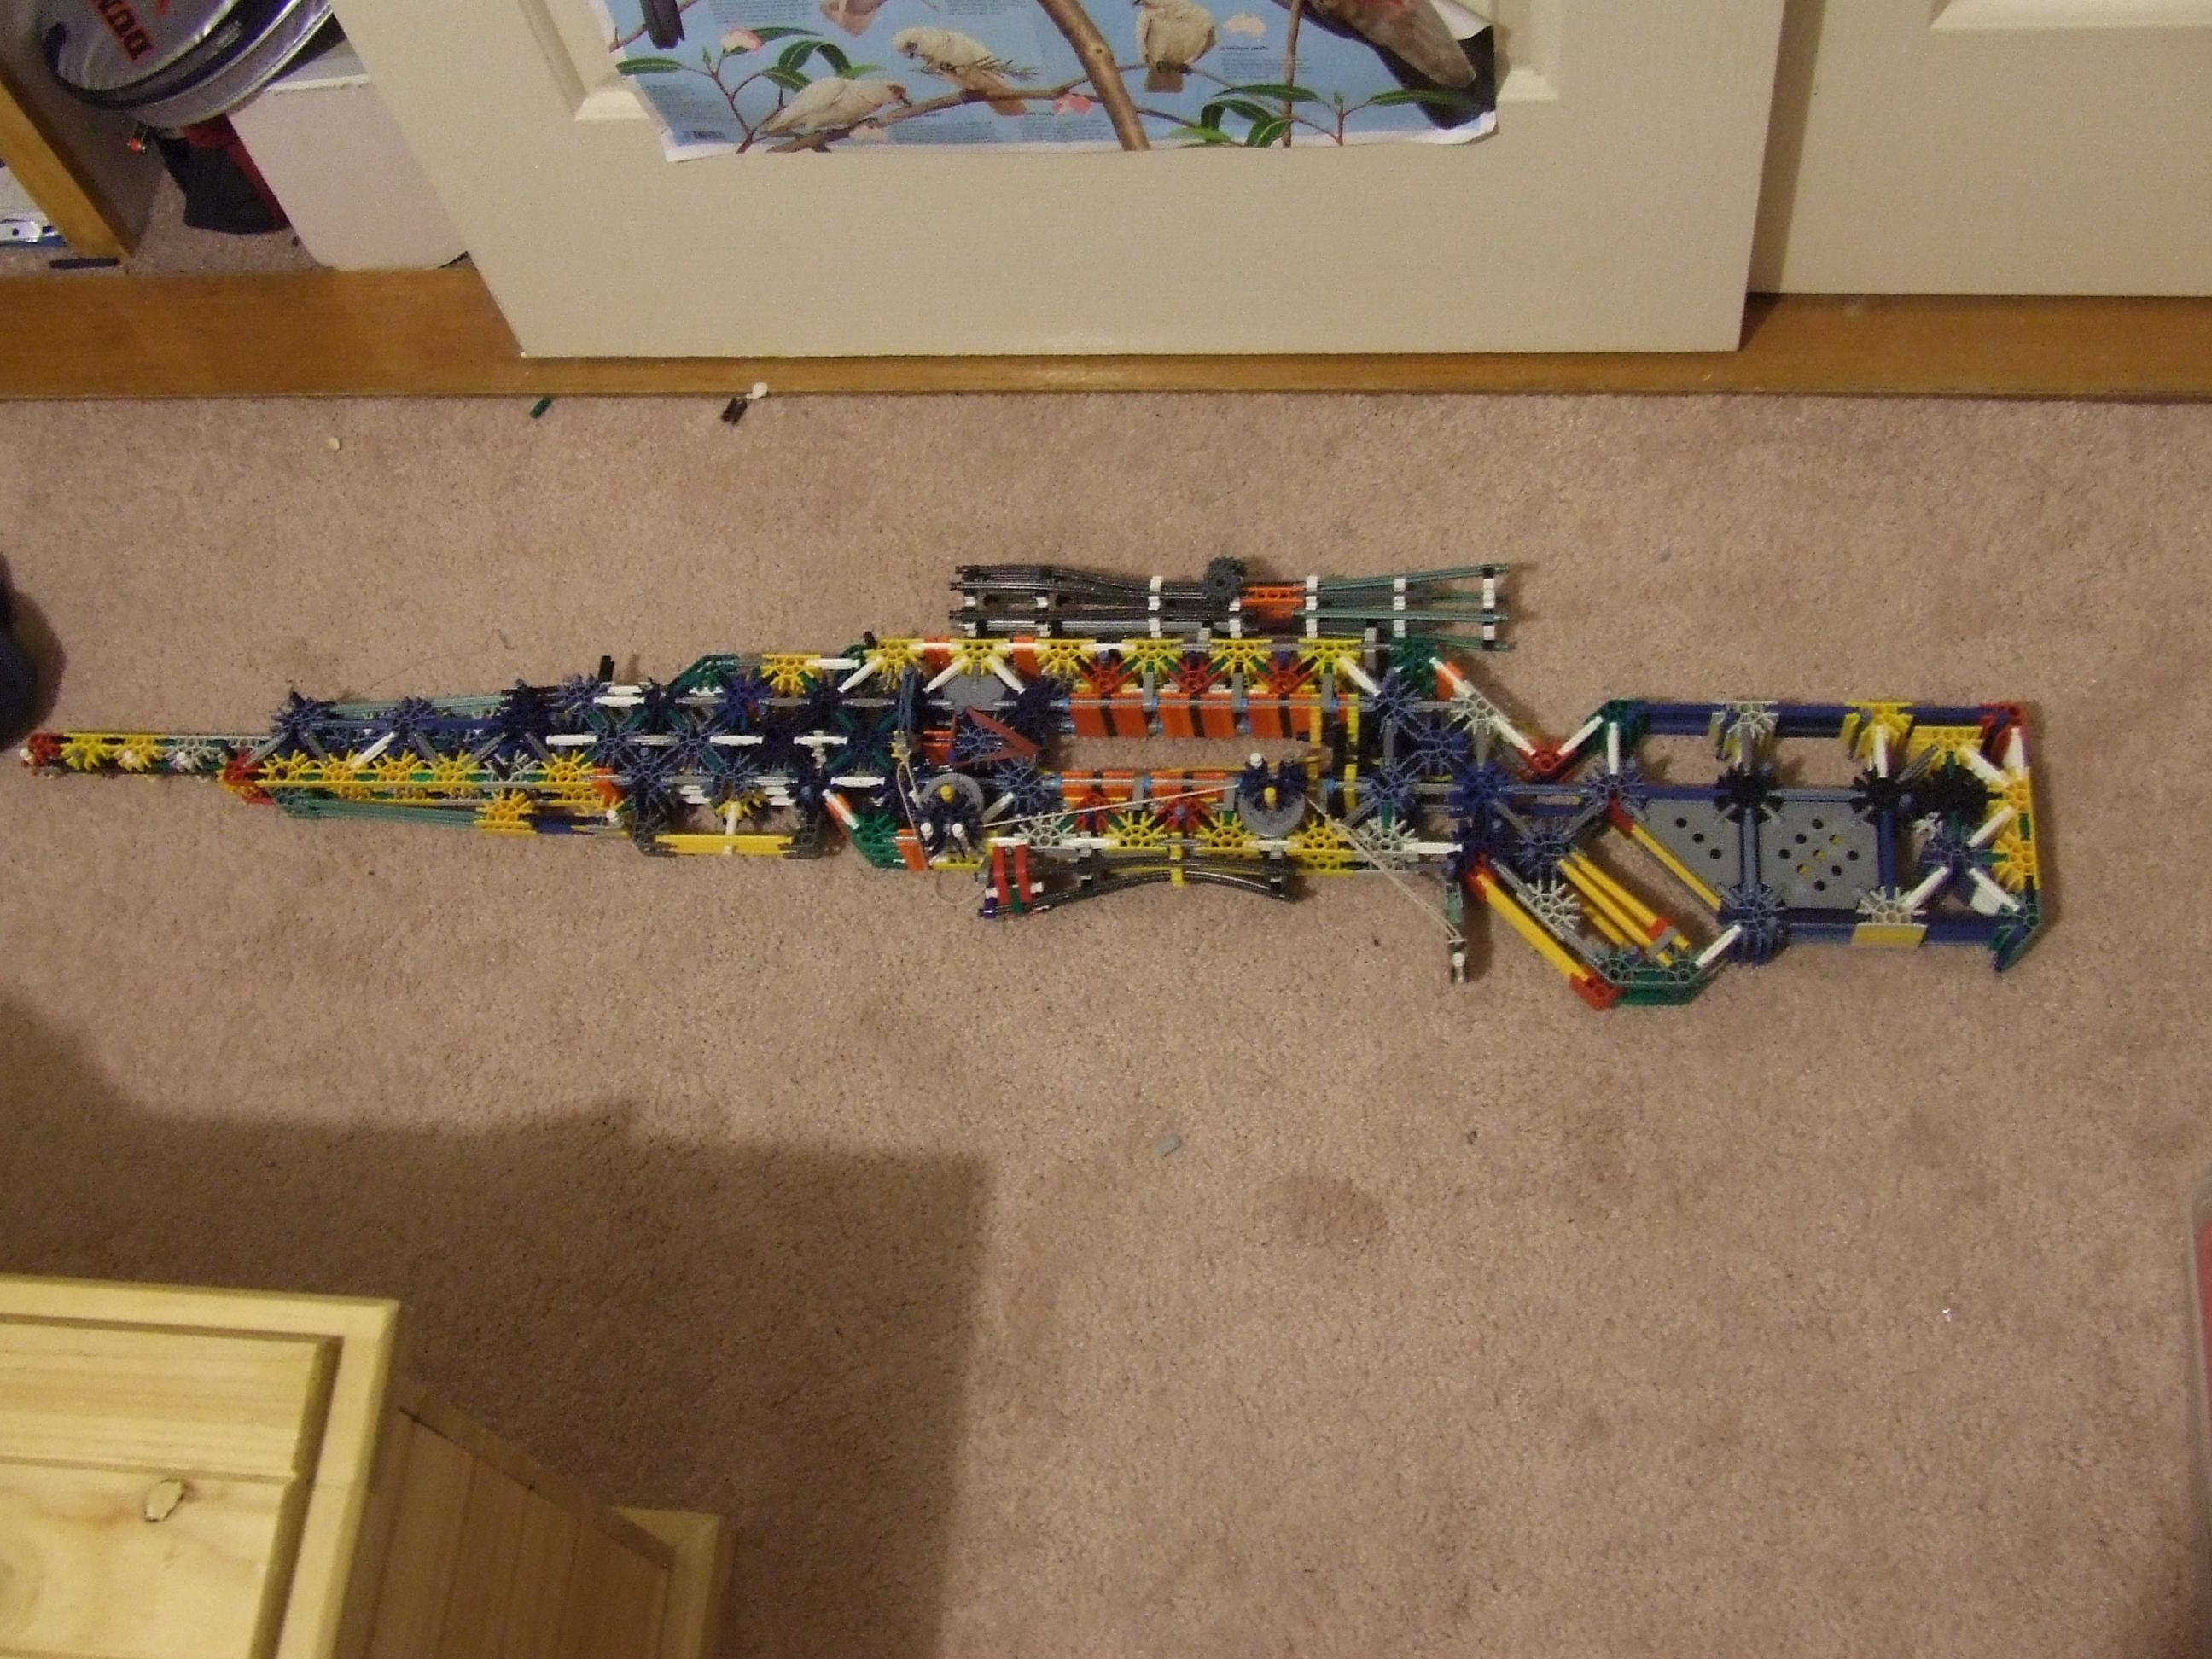 Modded version of the Morretti Sniper